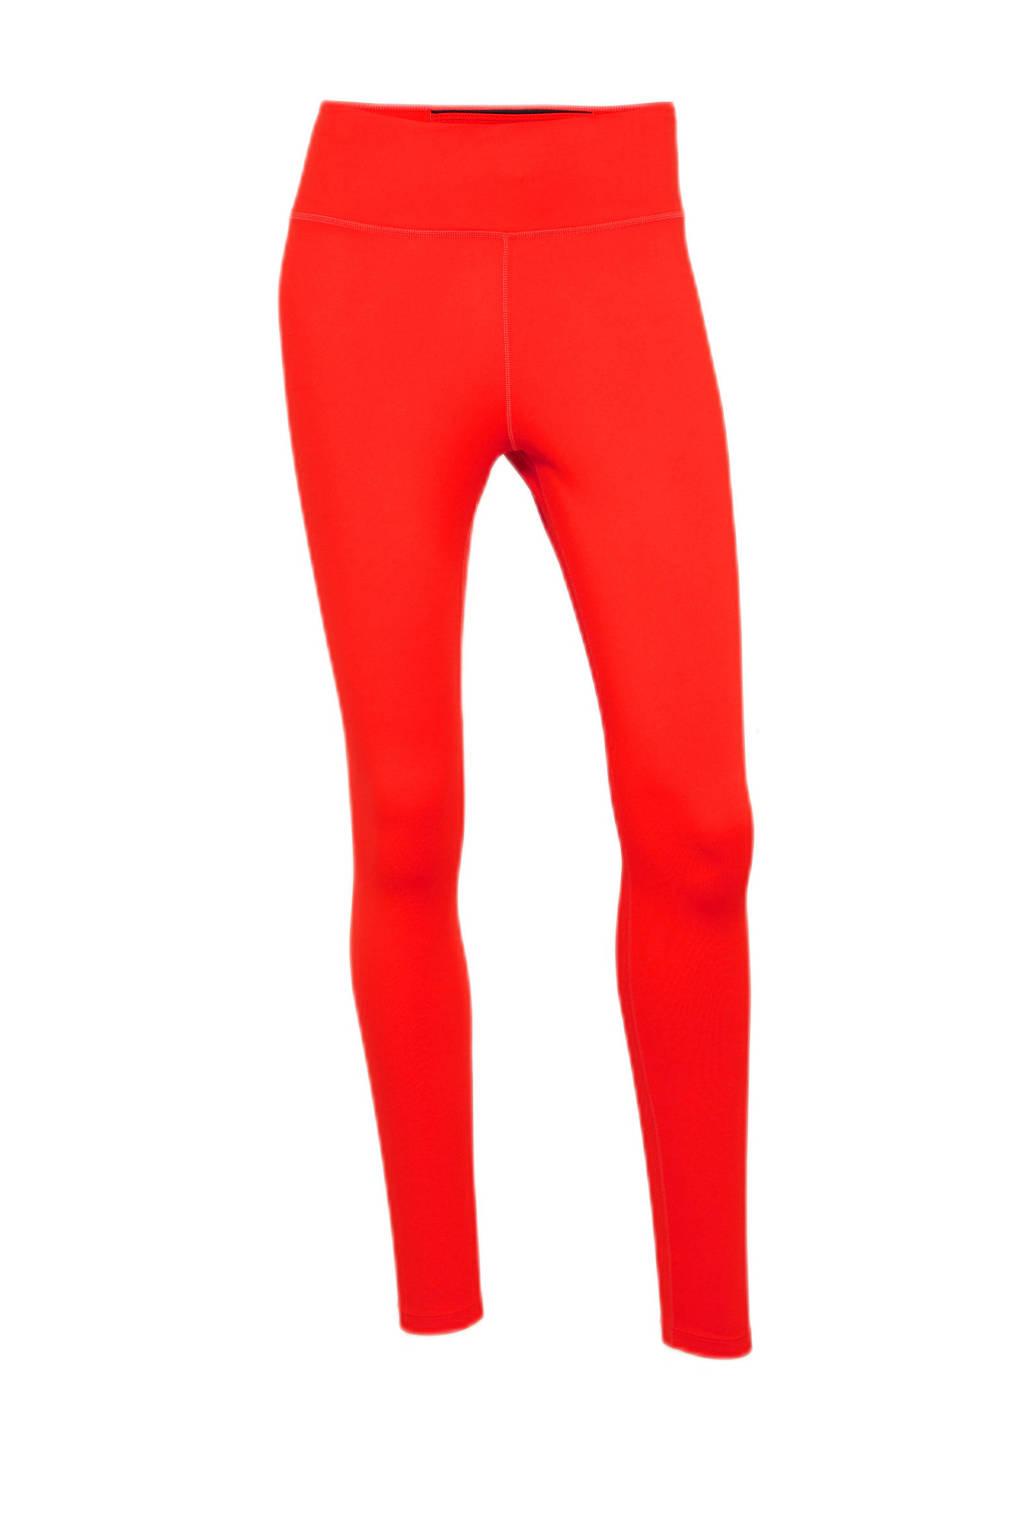 Nike sportlegging rood/zwart, Rood/wit